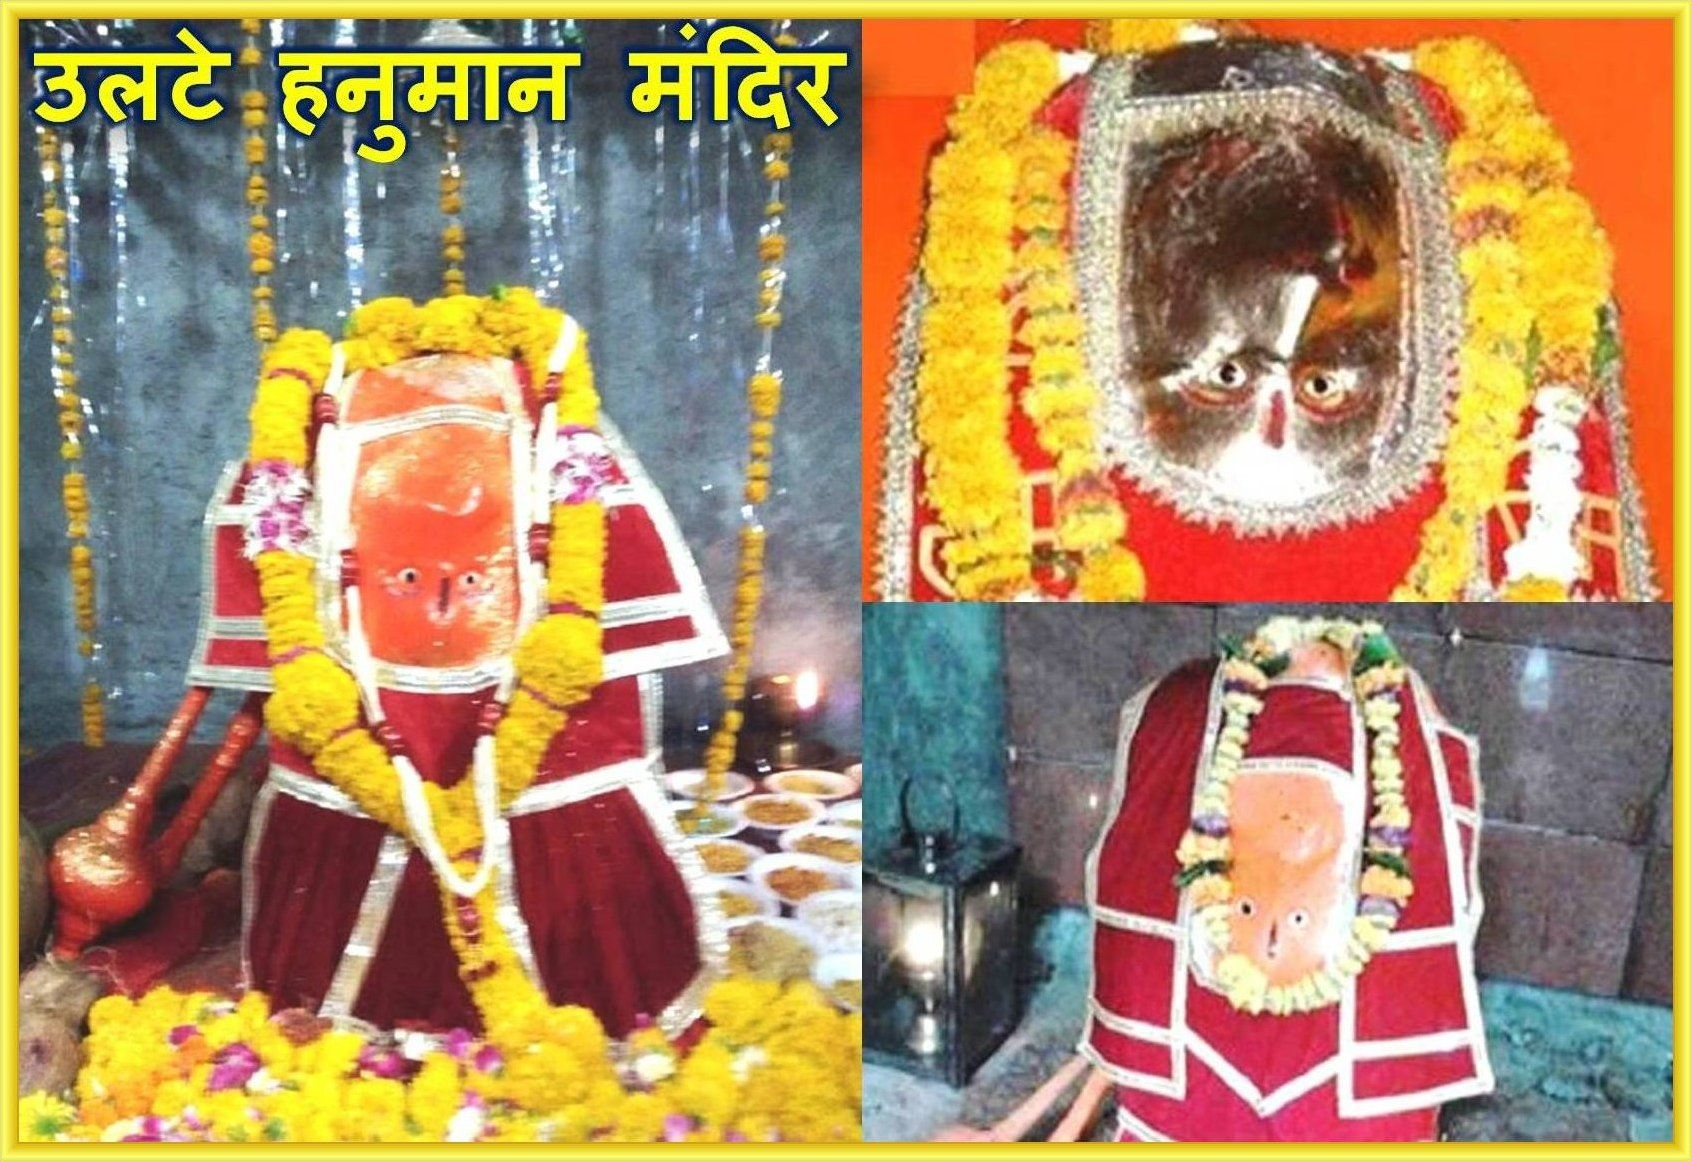 ulte hanuman mandir is located at sanwer town belongs to indore